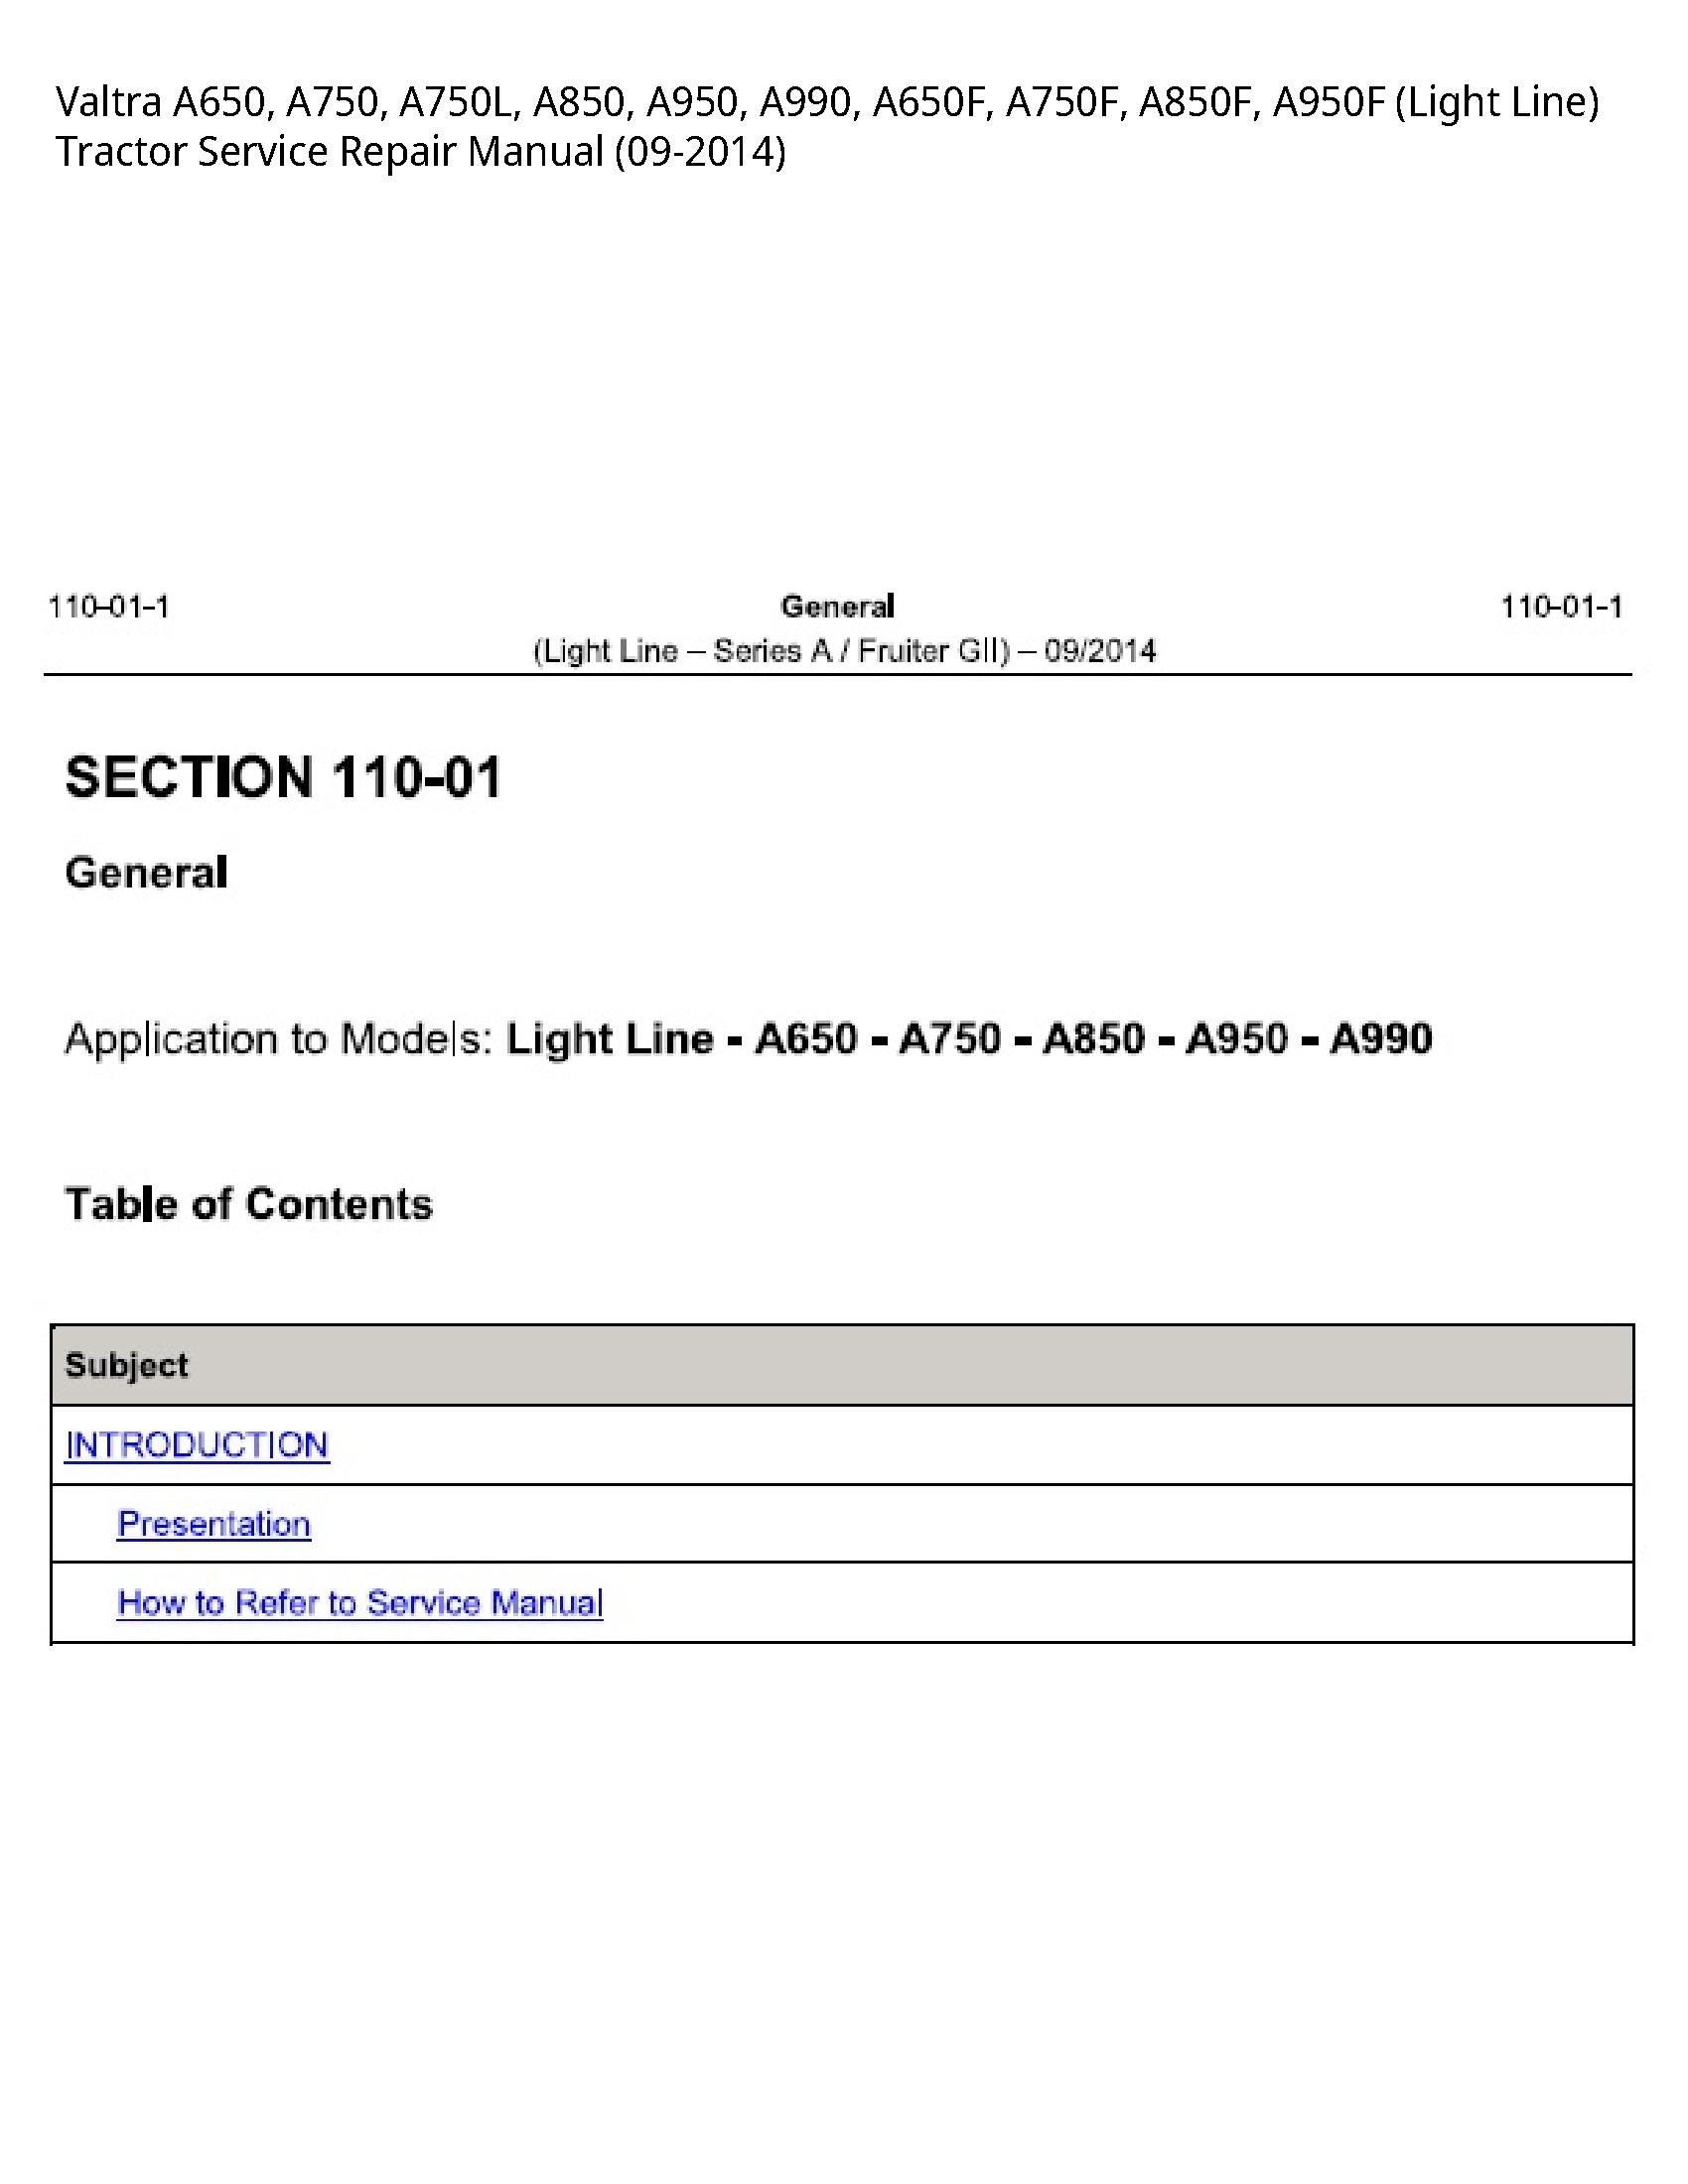 Valtra A650 (Light Line) Tractor manual